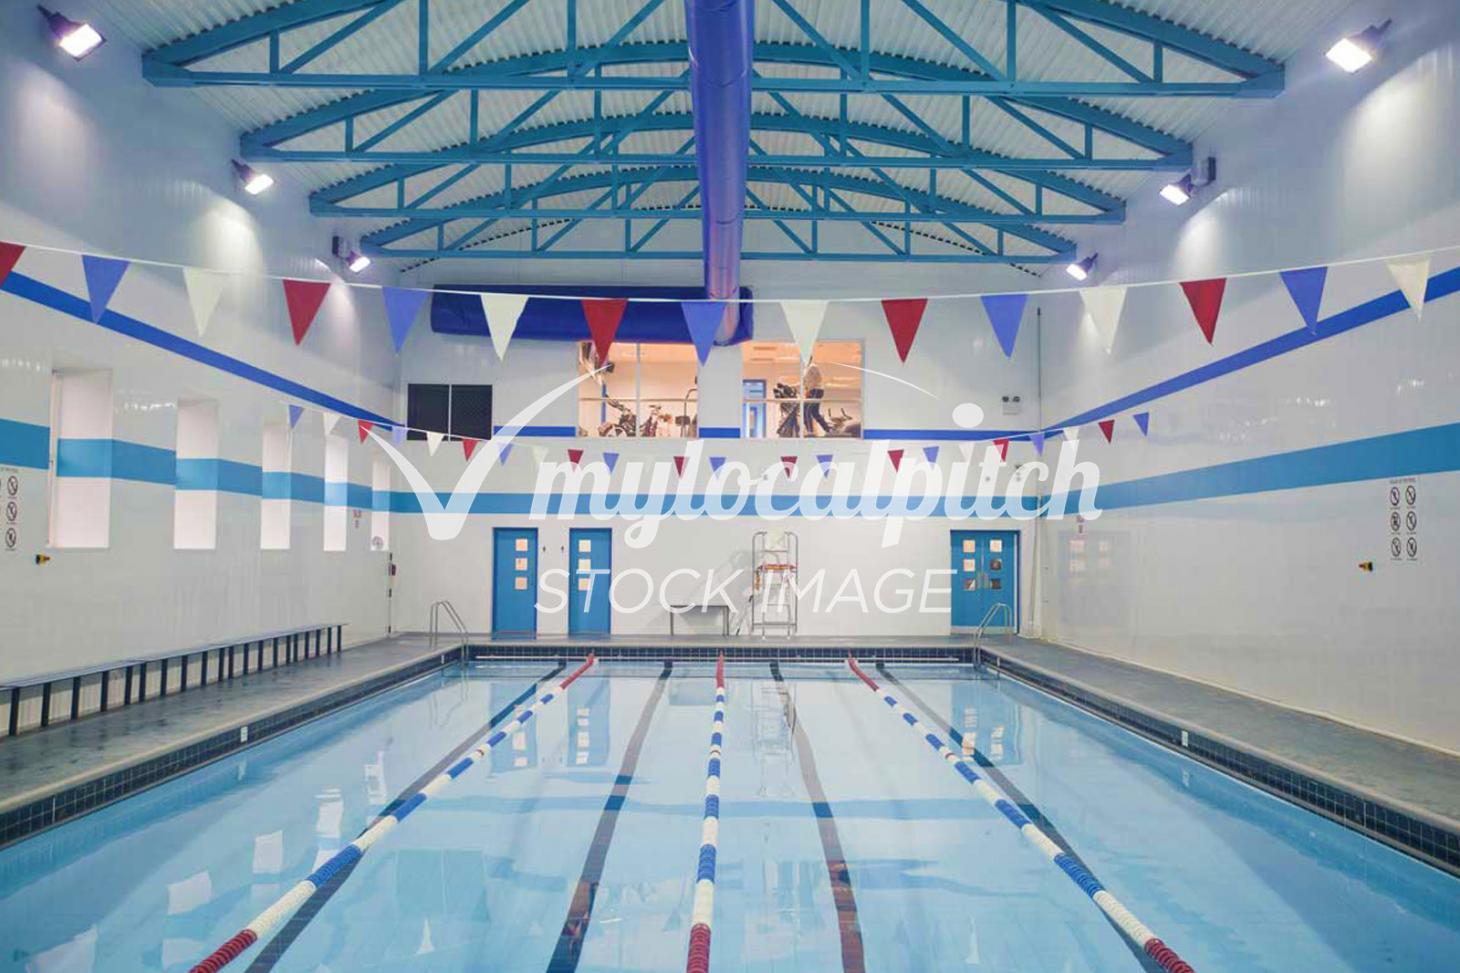 David Lloyd Finchley Outdoor swimming pool